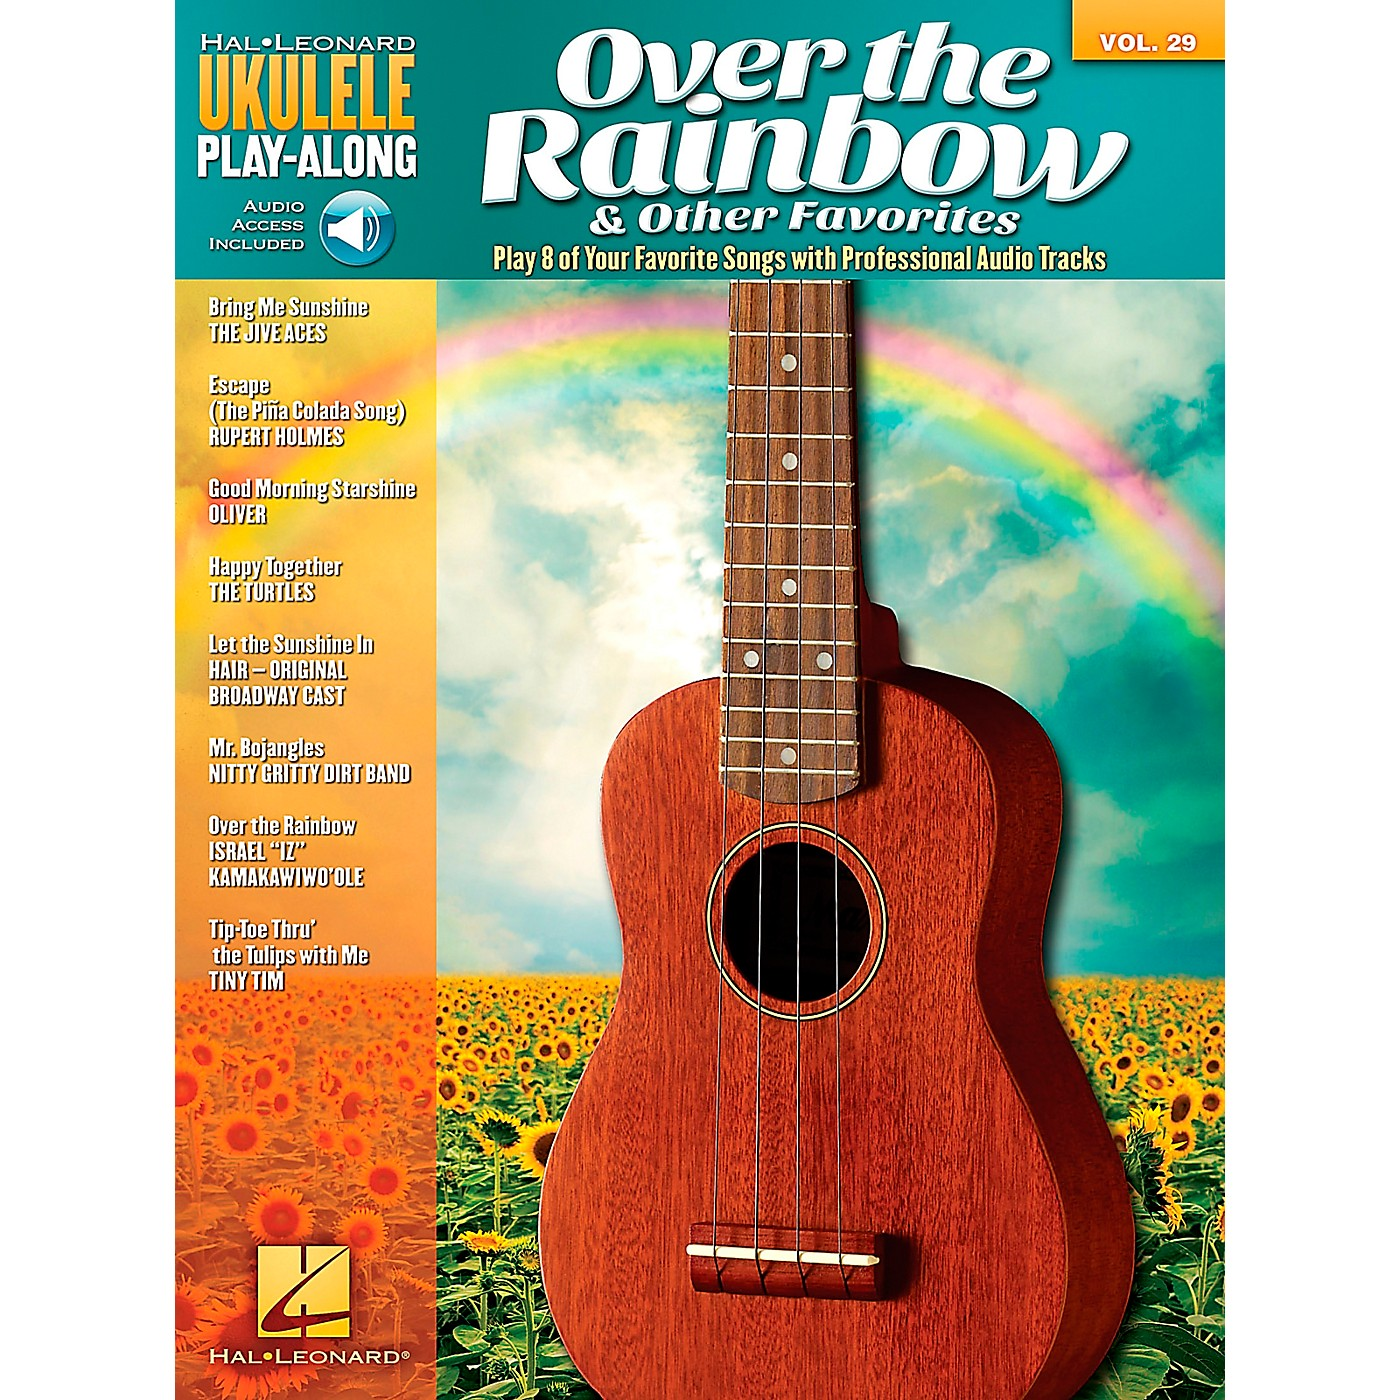 Hal Leonard Over The Rainbow & Other Favorites - Ukulele Play-Along Vol. 29 Book/CD thumbnail